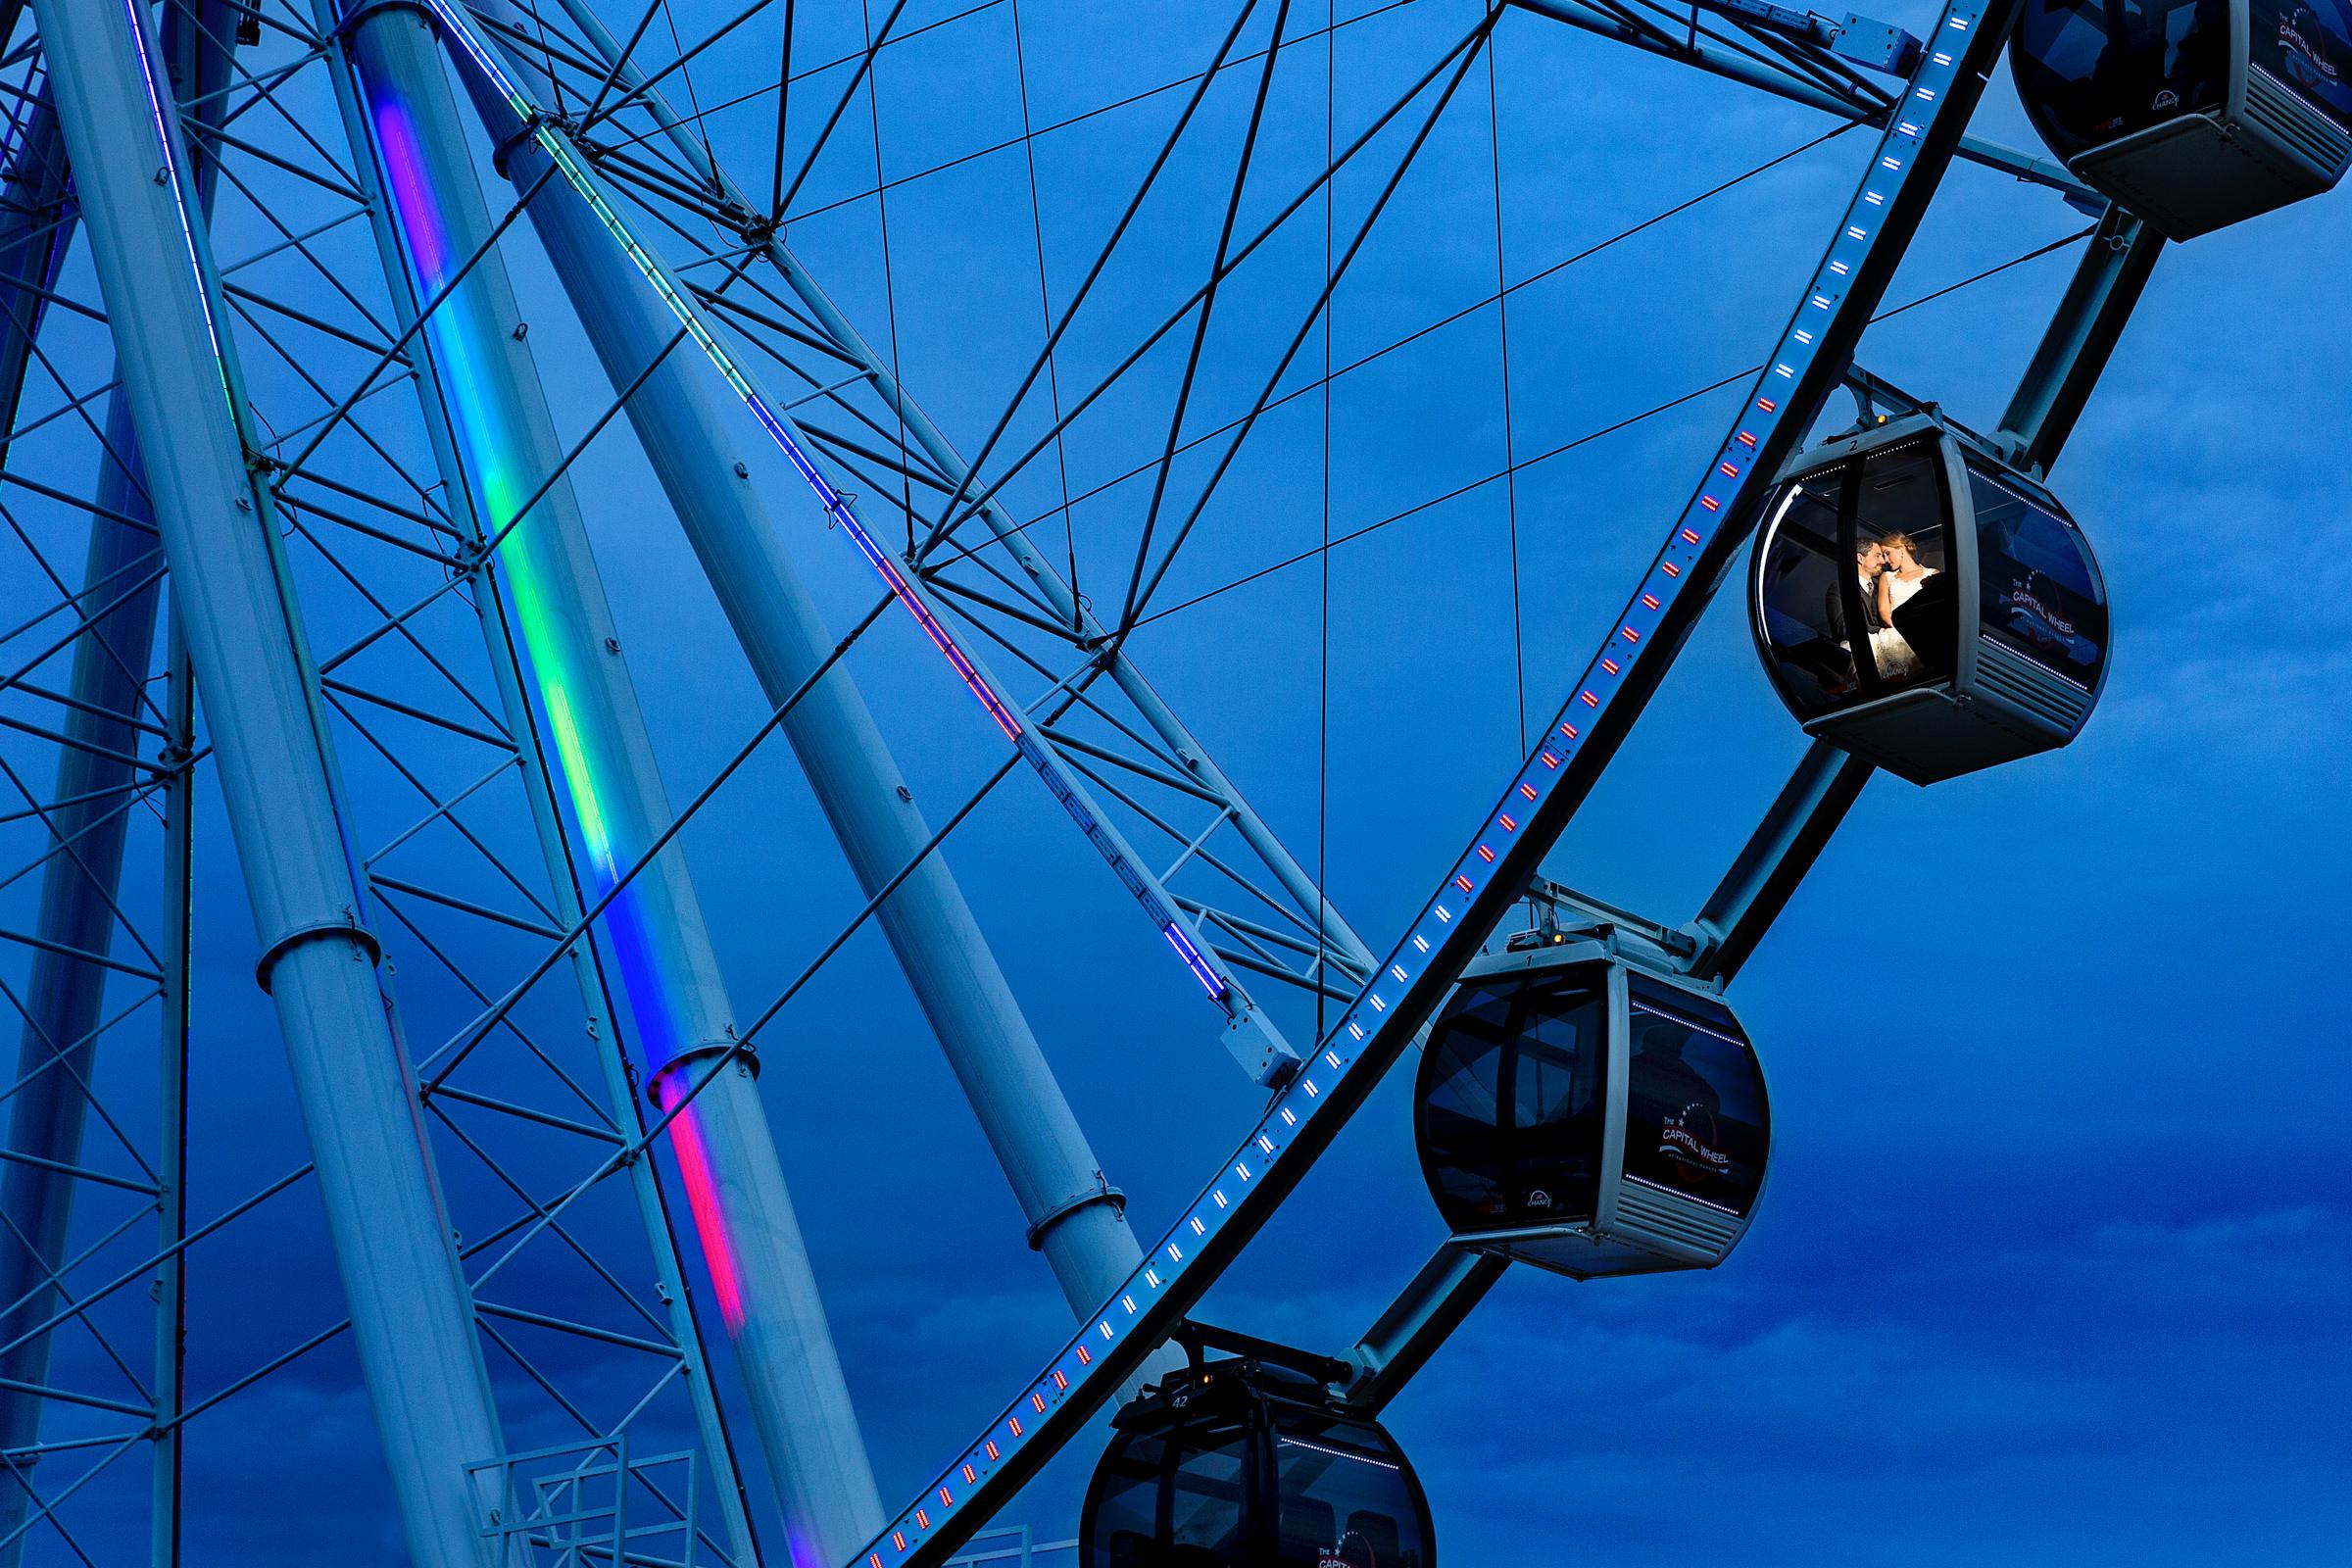 couple-kiss-in-ferris-wheel-against-blue-sky-procopio-photography